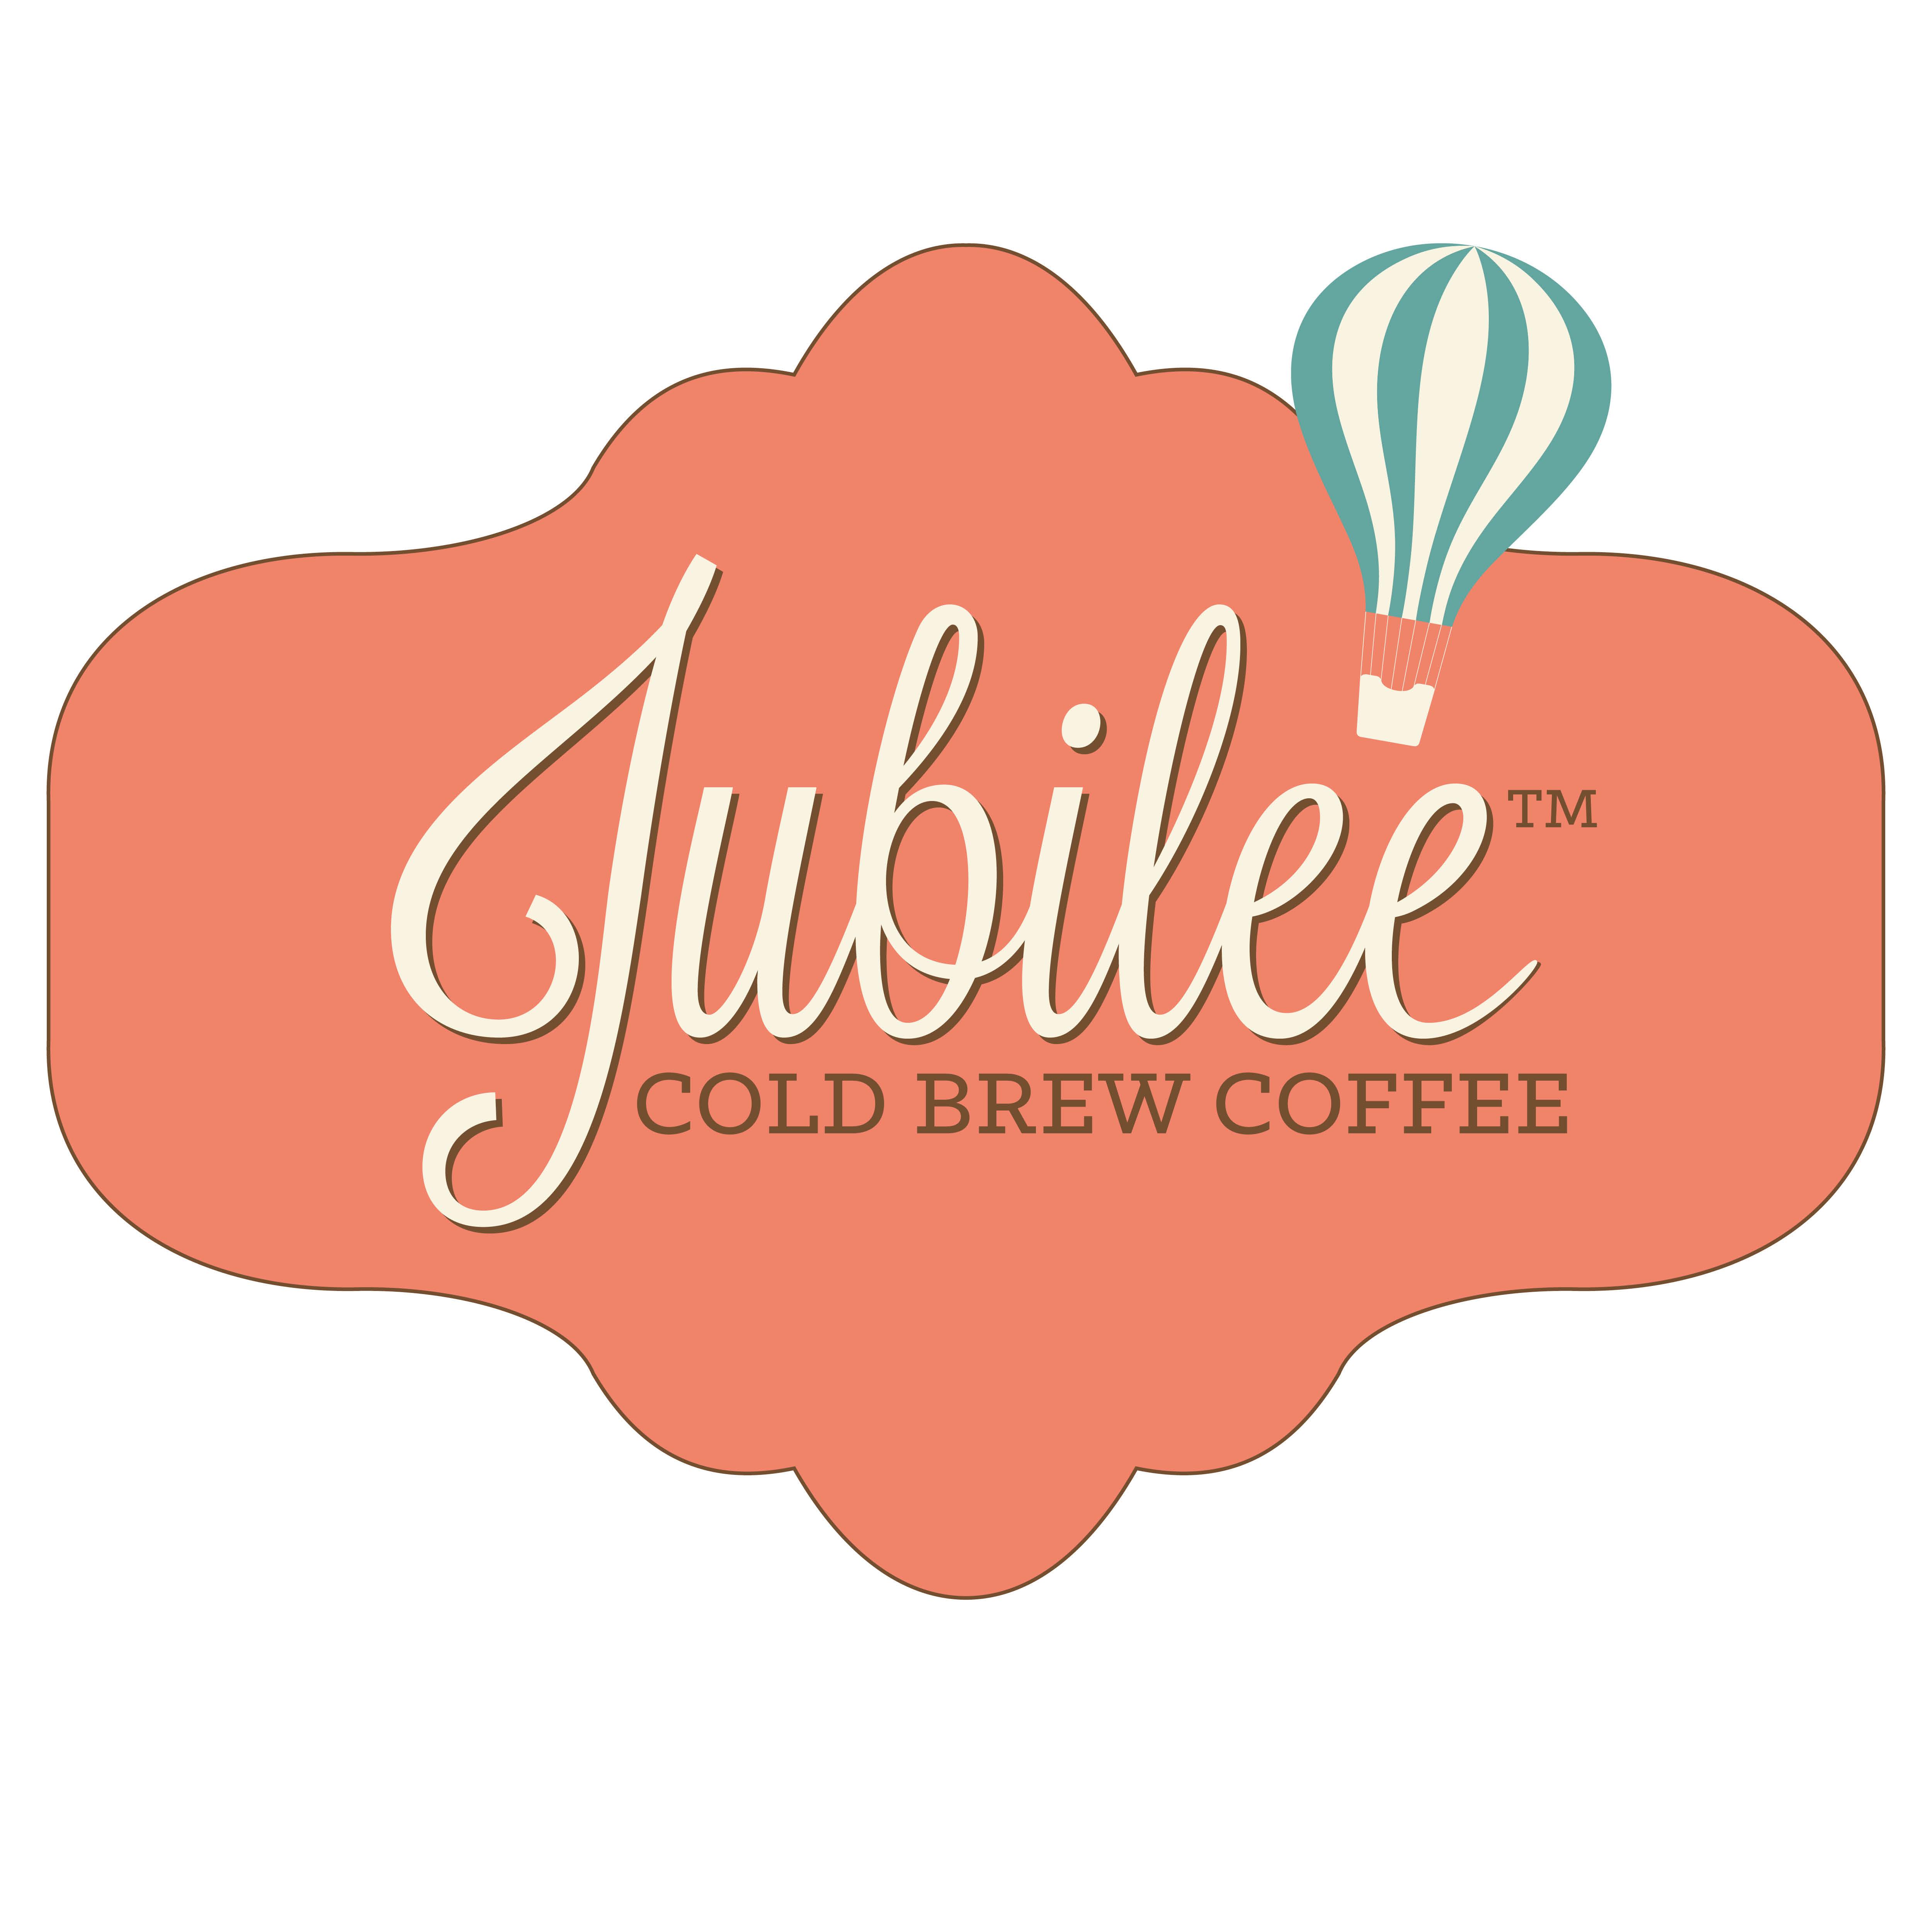 Jubilee Cold Brew's logo